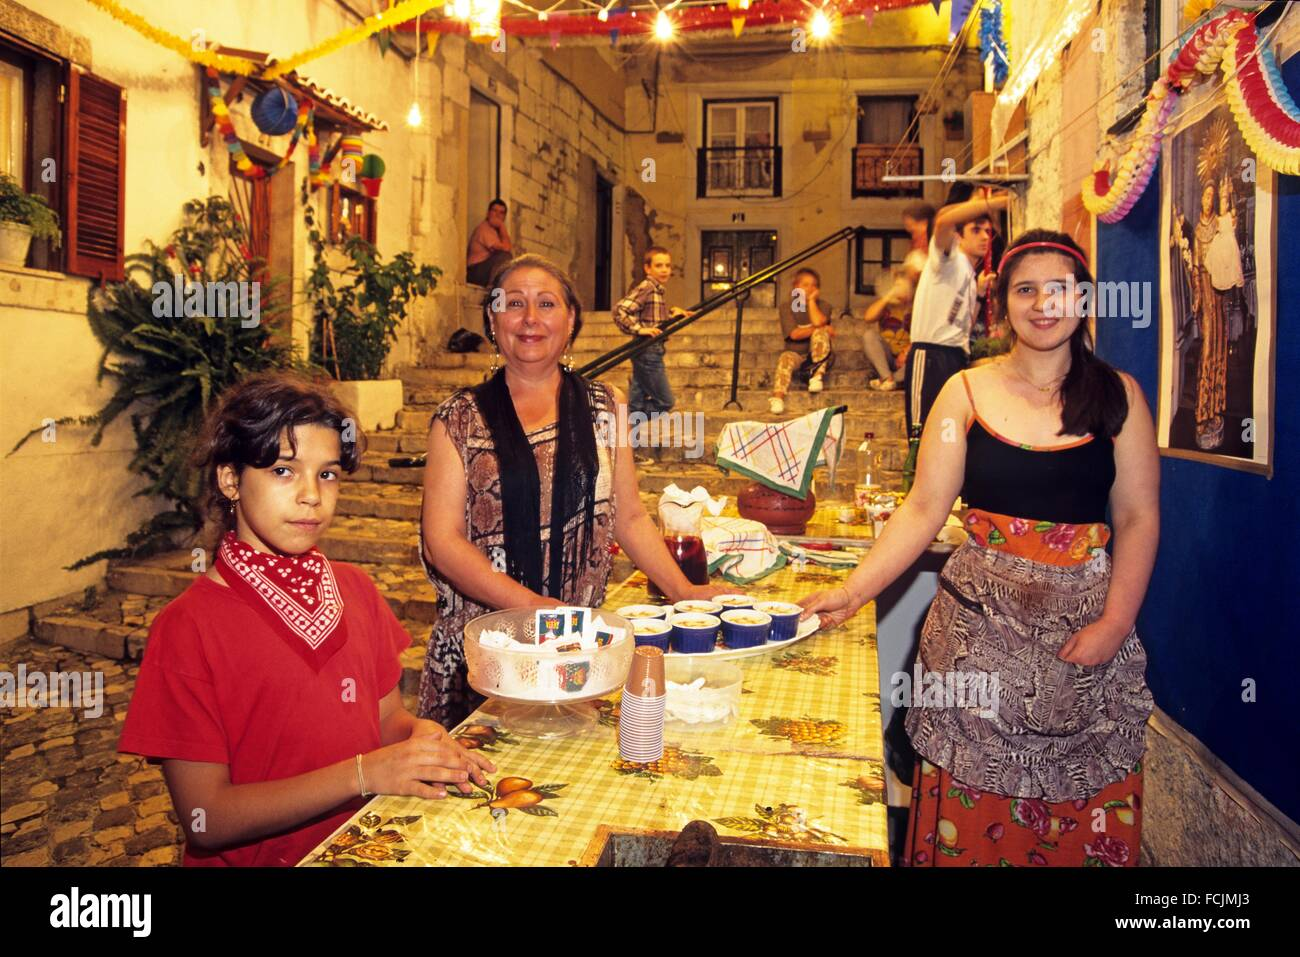 Arroz doce sweet rice, Santo Antonio festivities in Alfama neighbourhood, Lisbon, Portugal, Southern Europe. - Stock Image